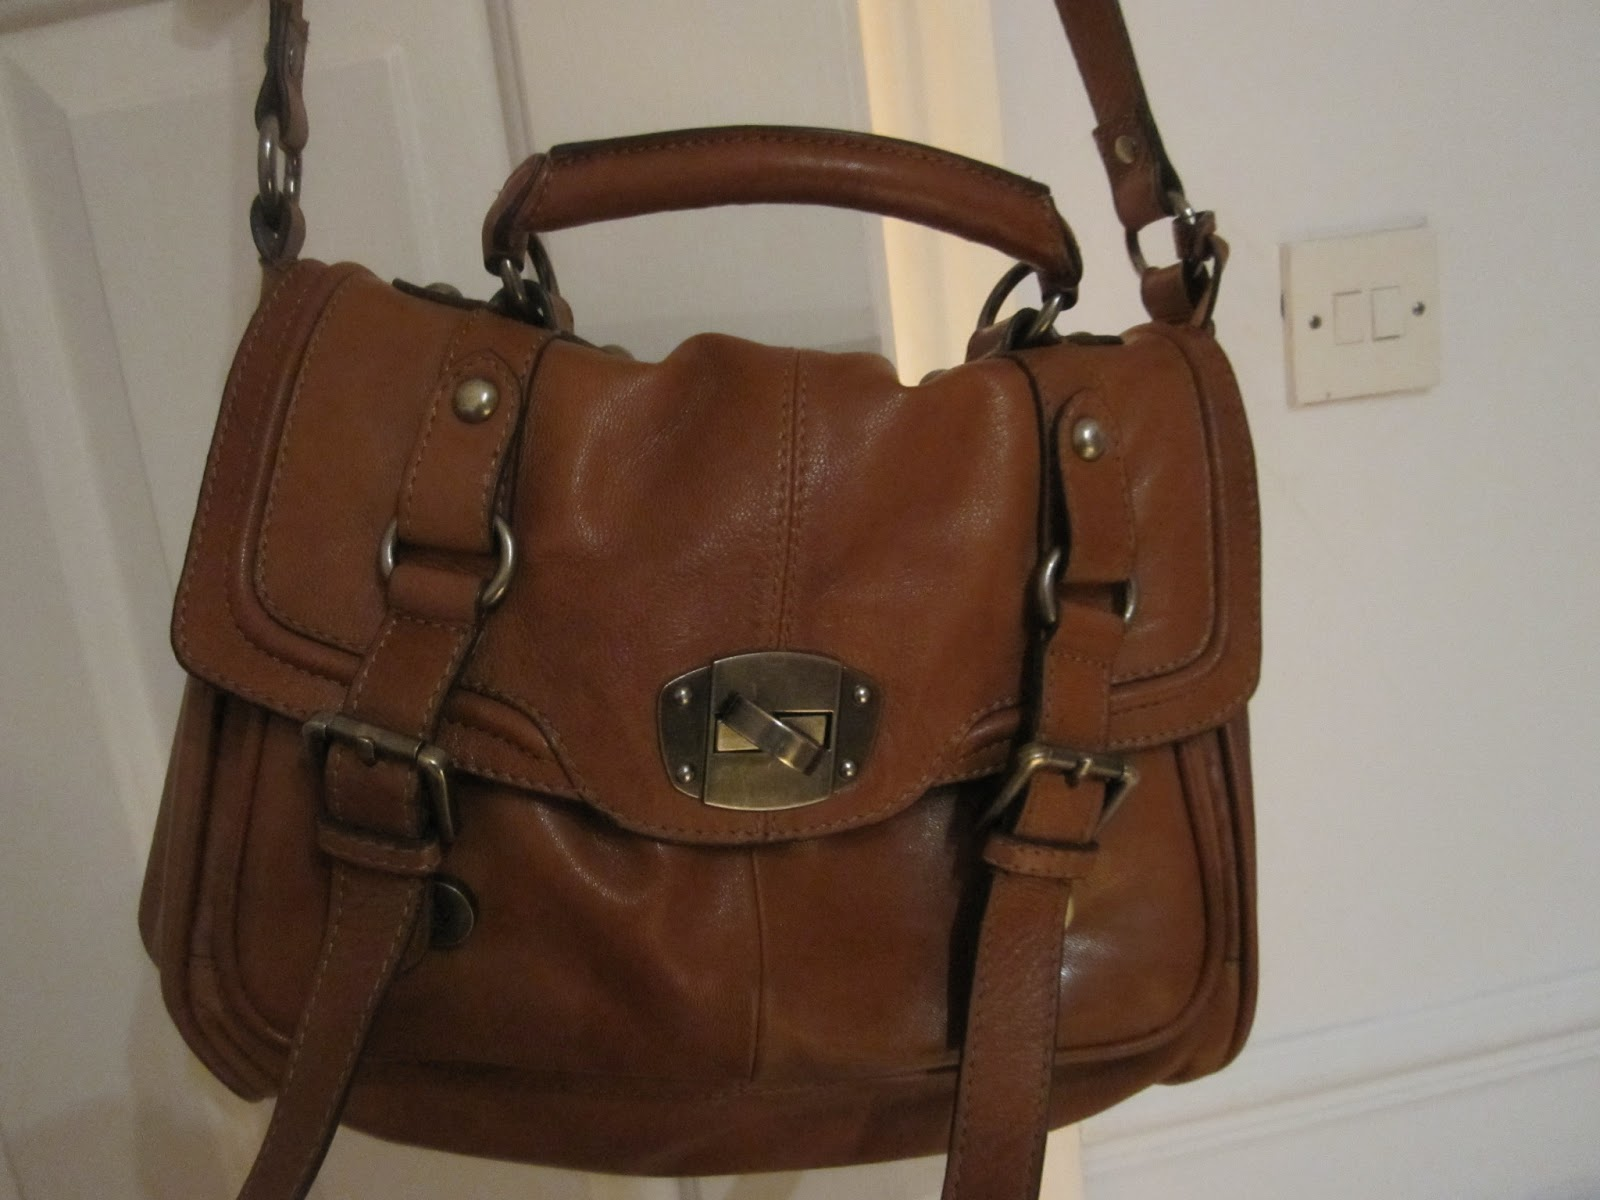 66c3bebcd2d clarks handbags leather shop